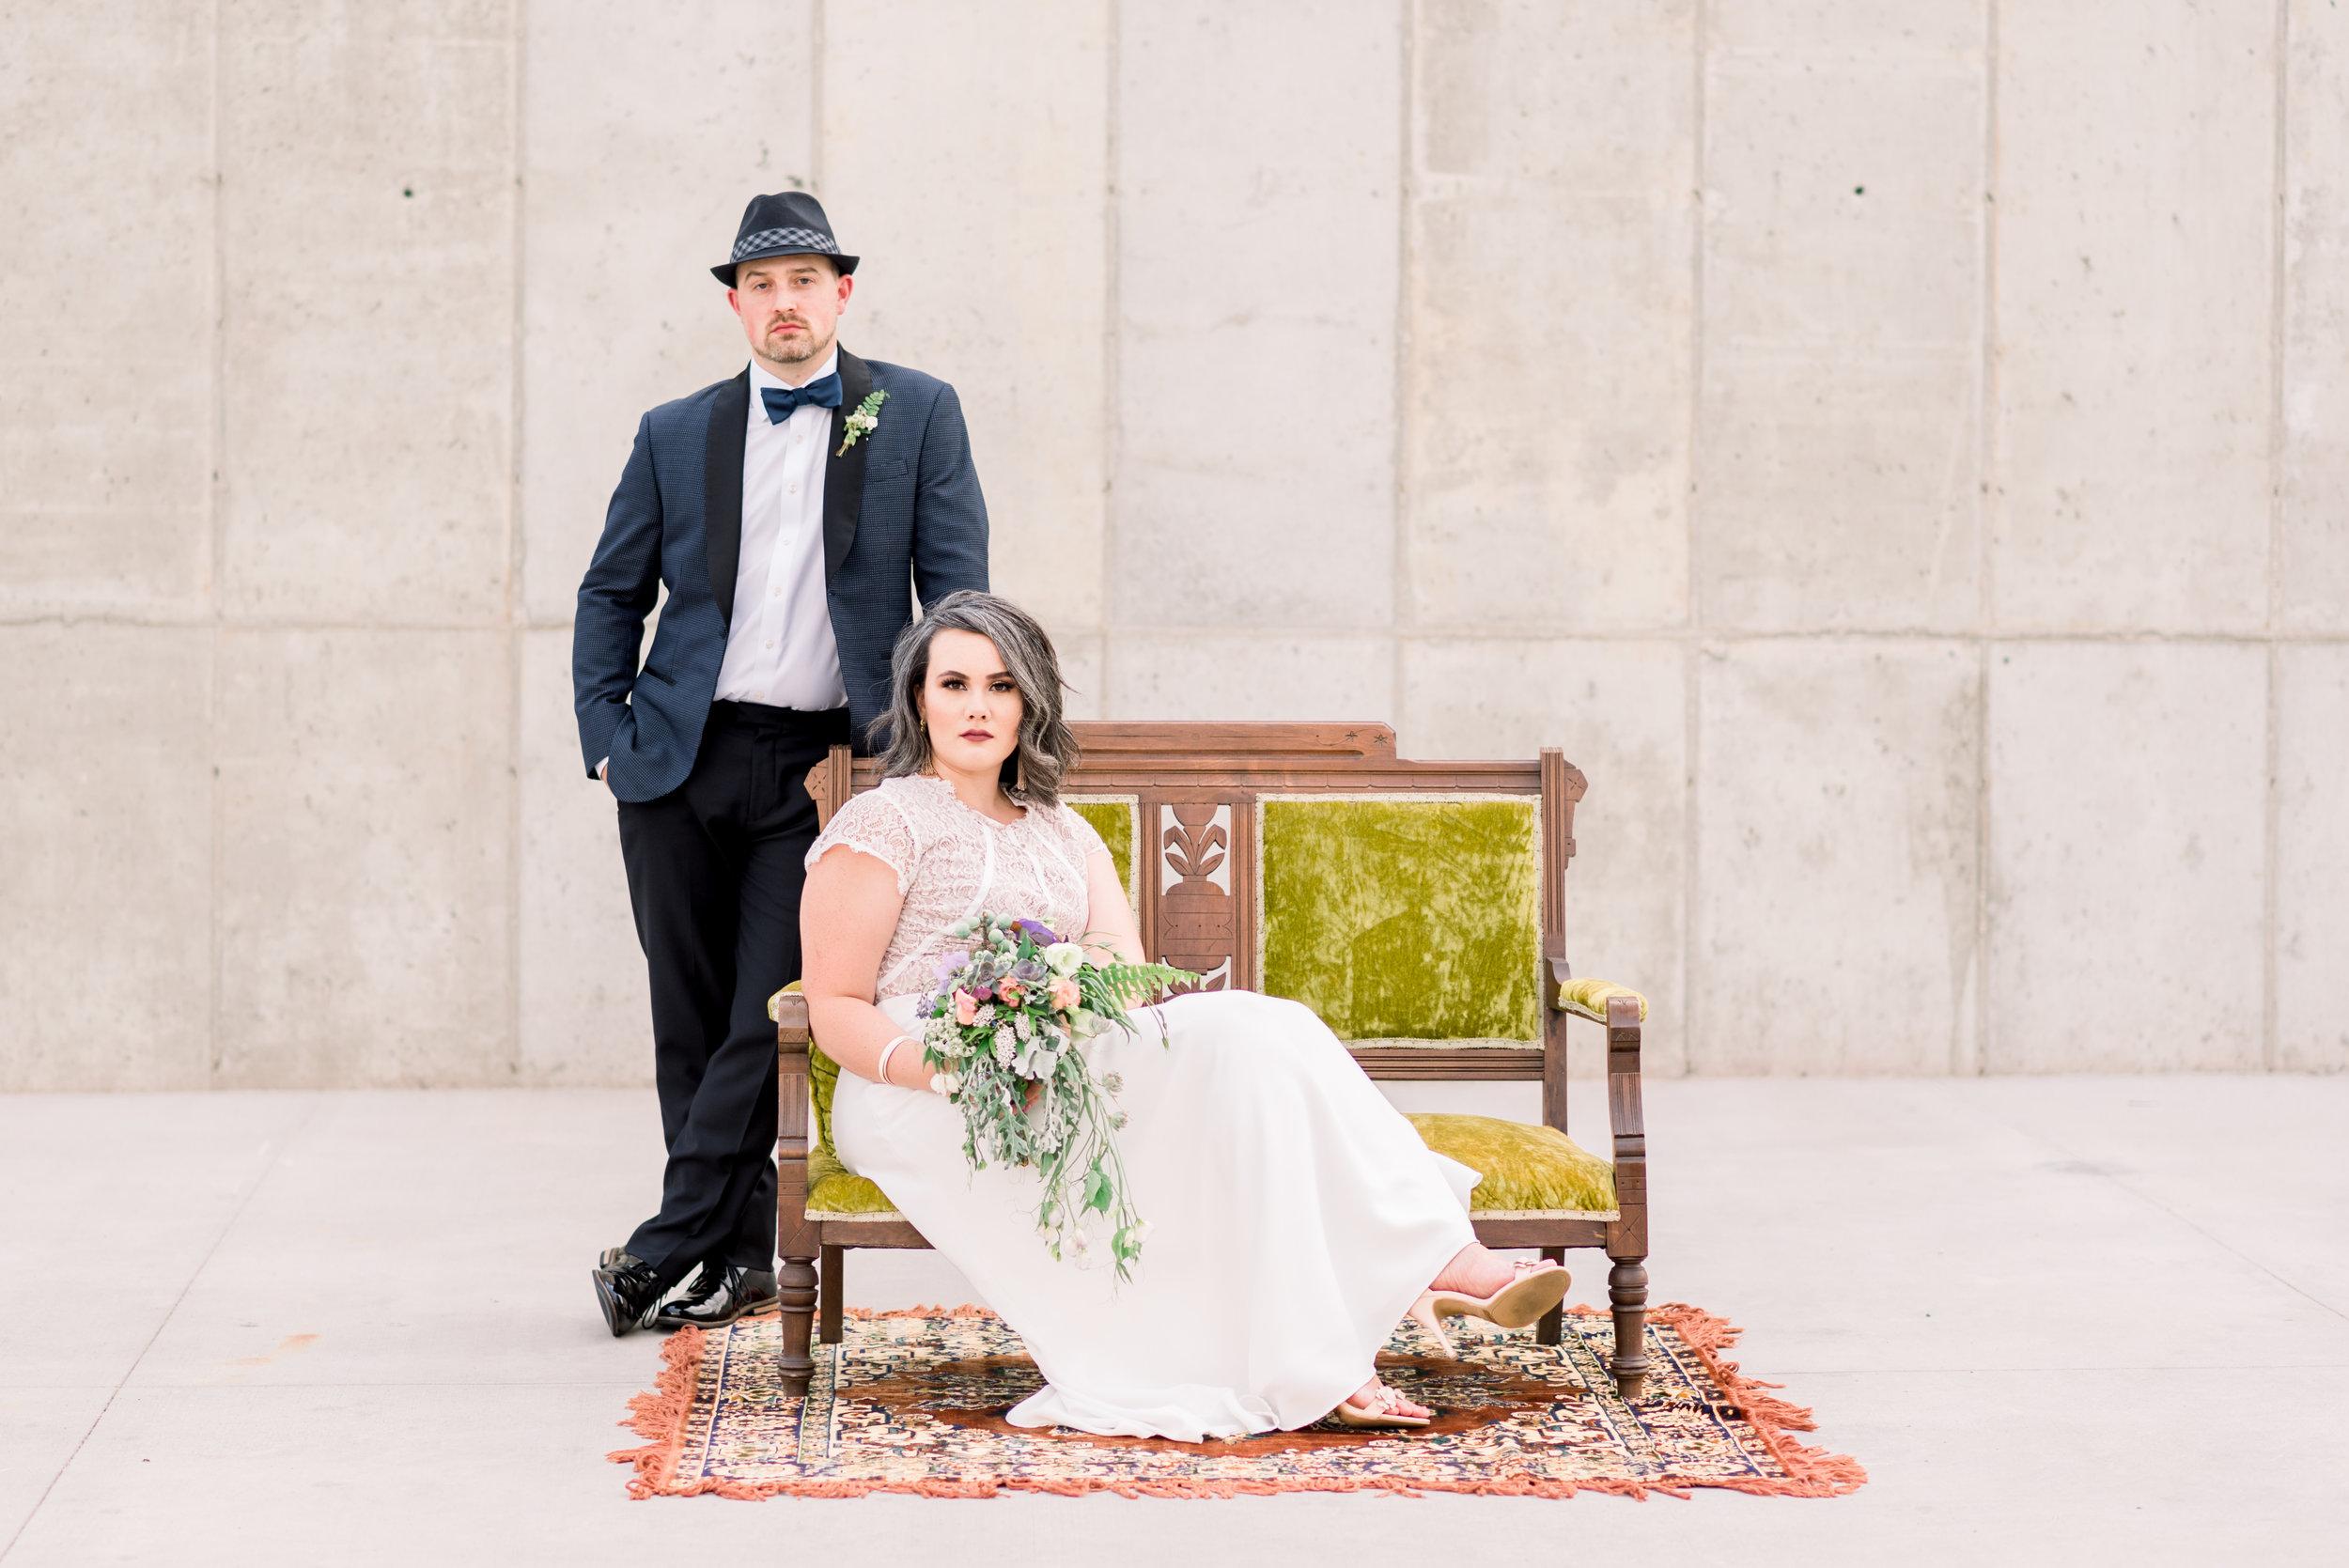 Wood-Violets-Vintage-Brewing-Company-Styled-Shoot-Blu-Moose-Photography-Miriam-Paul-Wedding-Photos-28.jpg